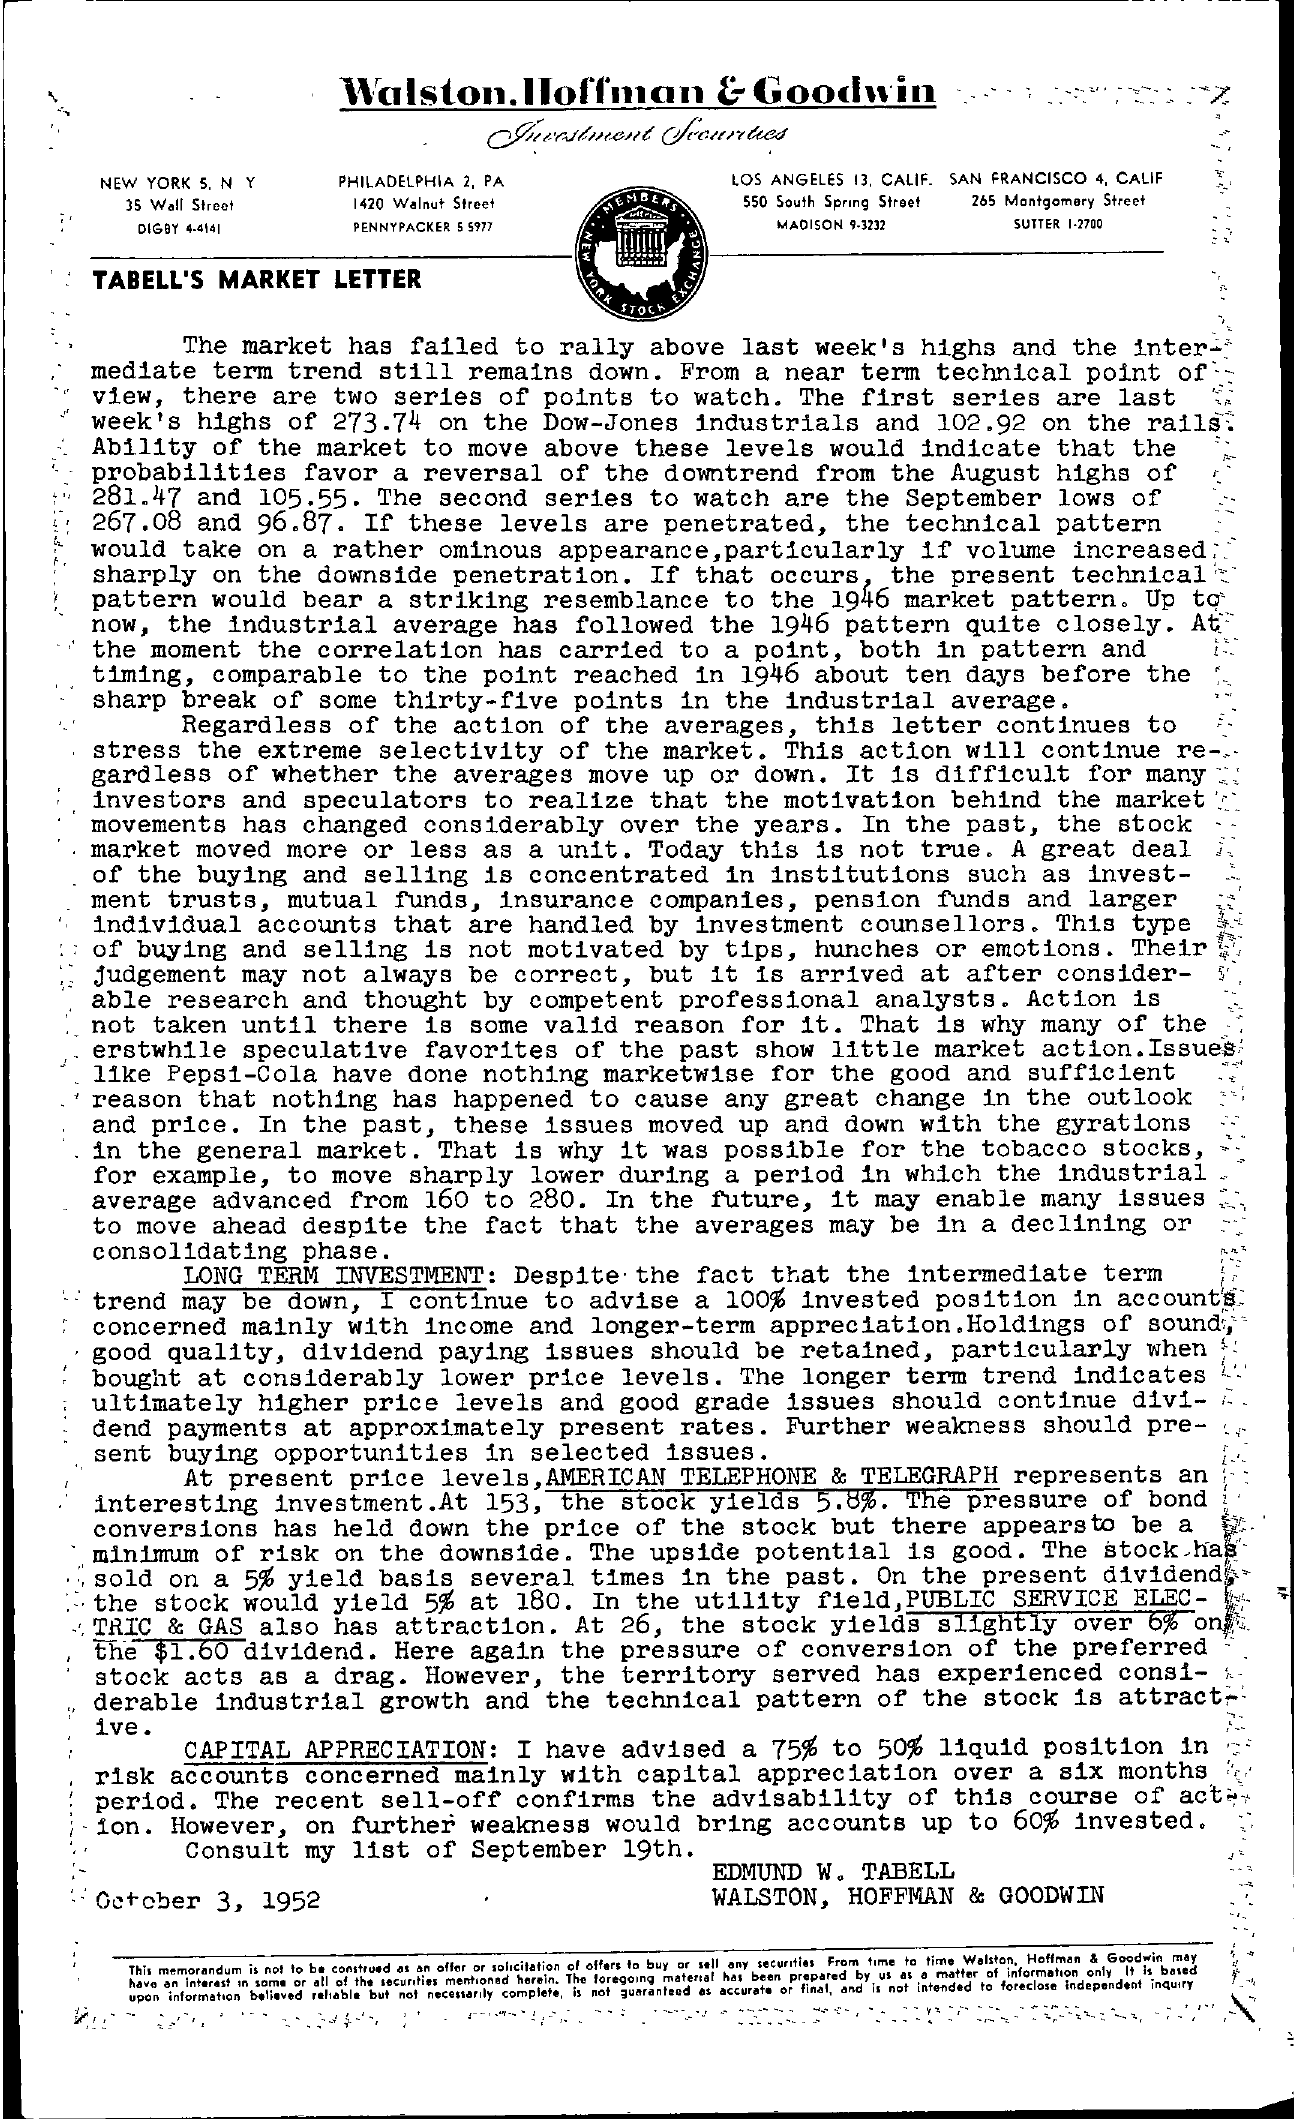 Tabell's Market Letter - October 03, 1952